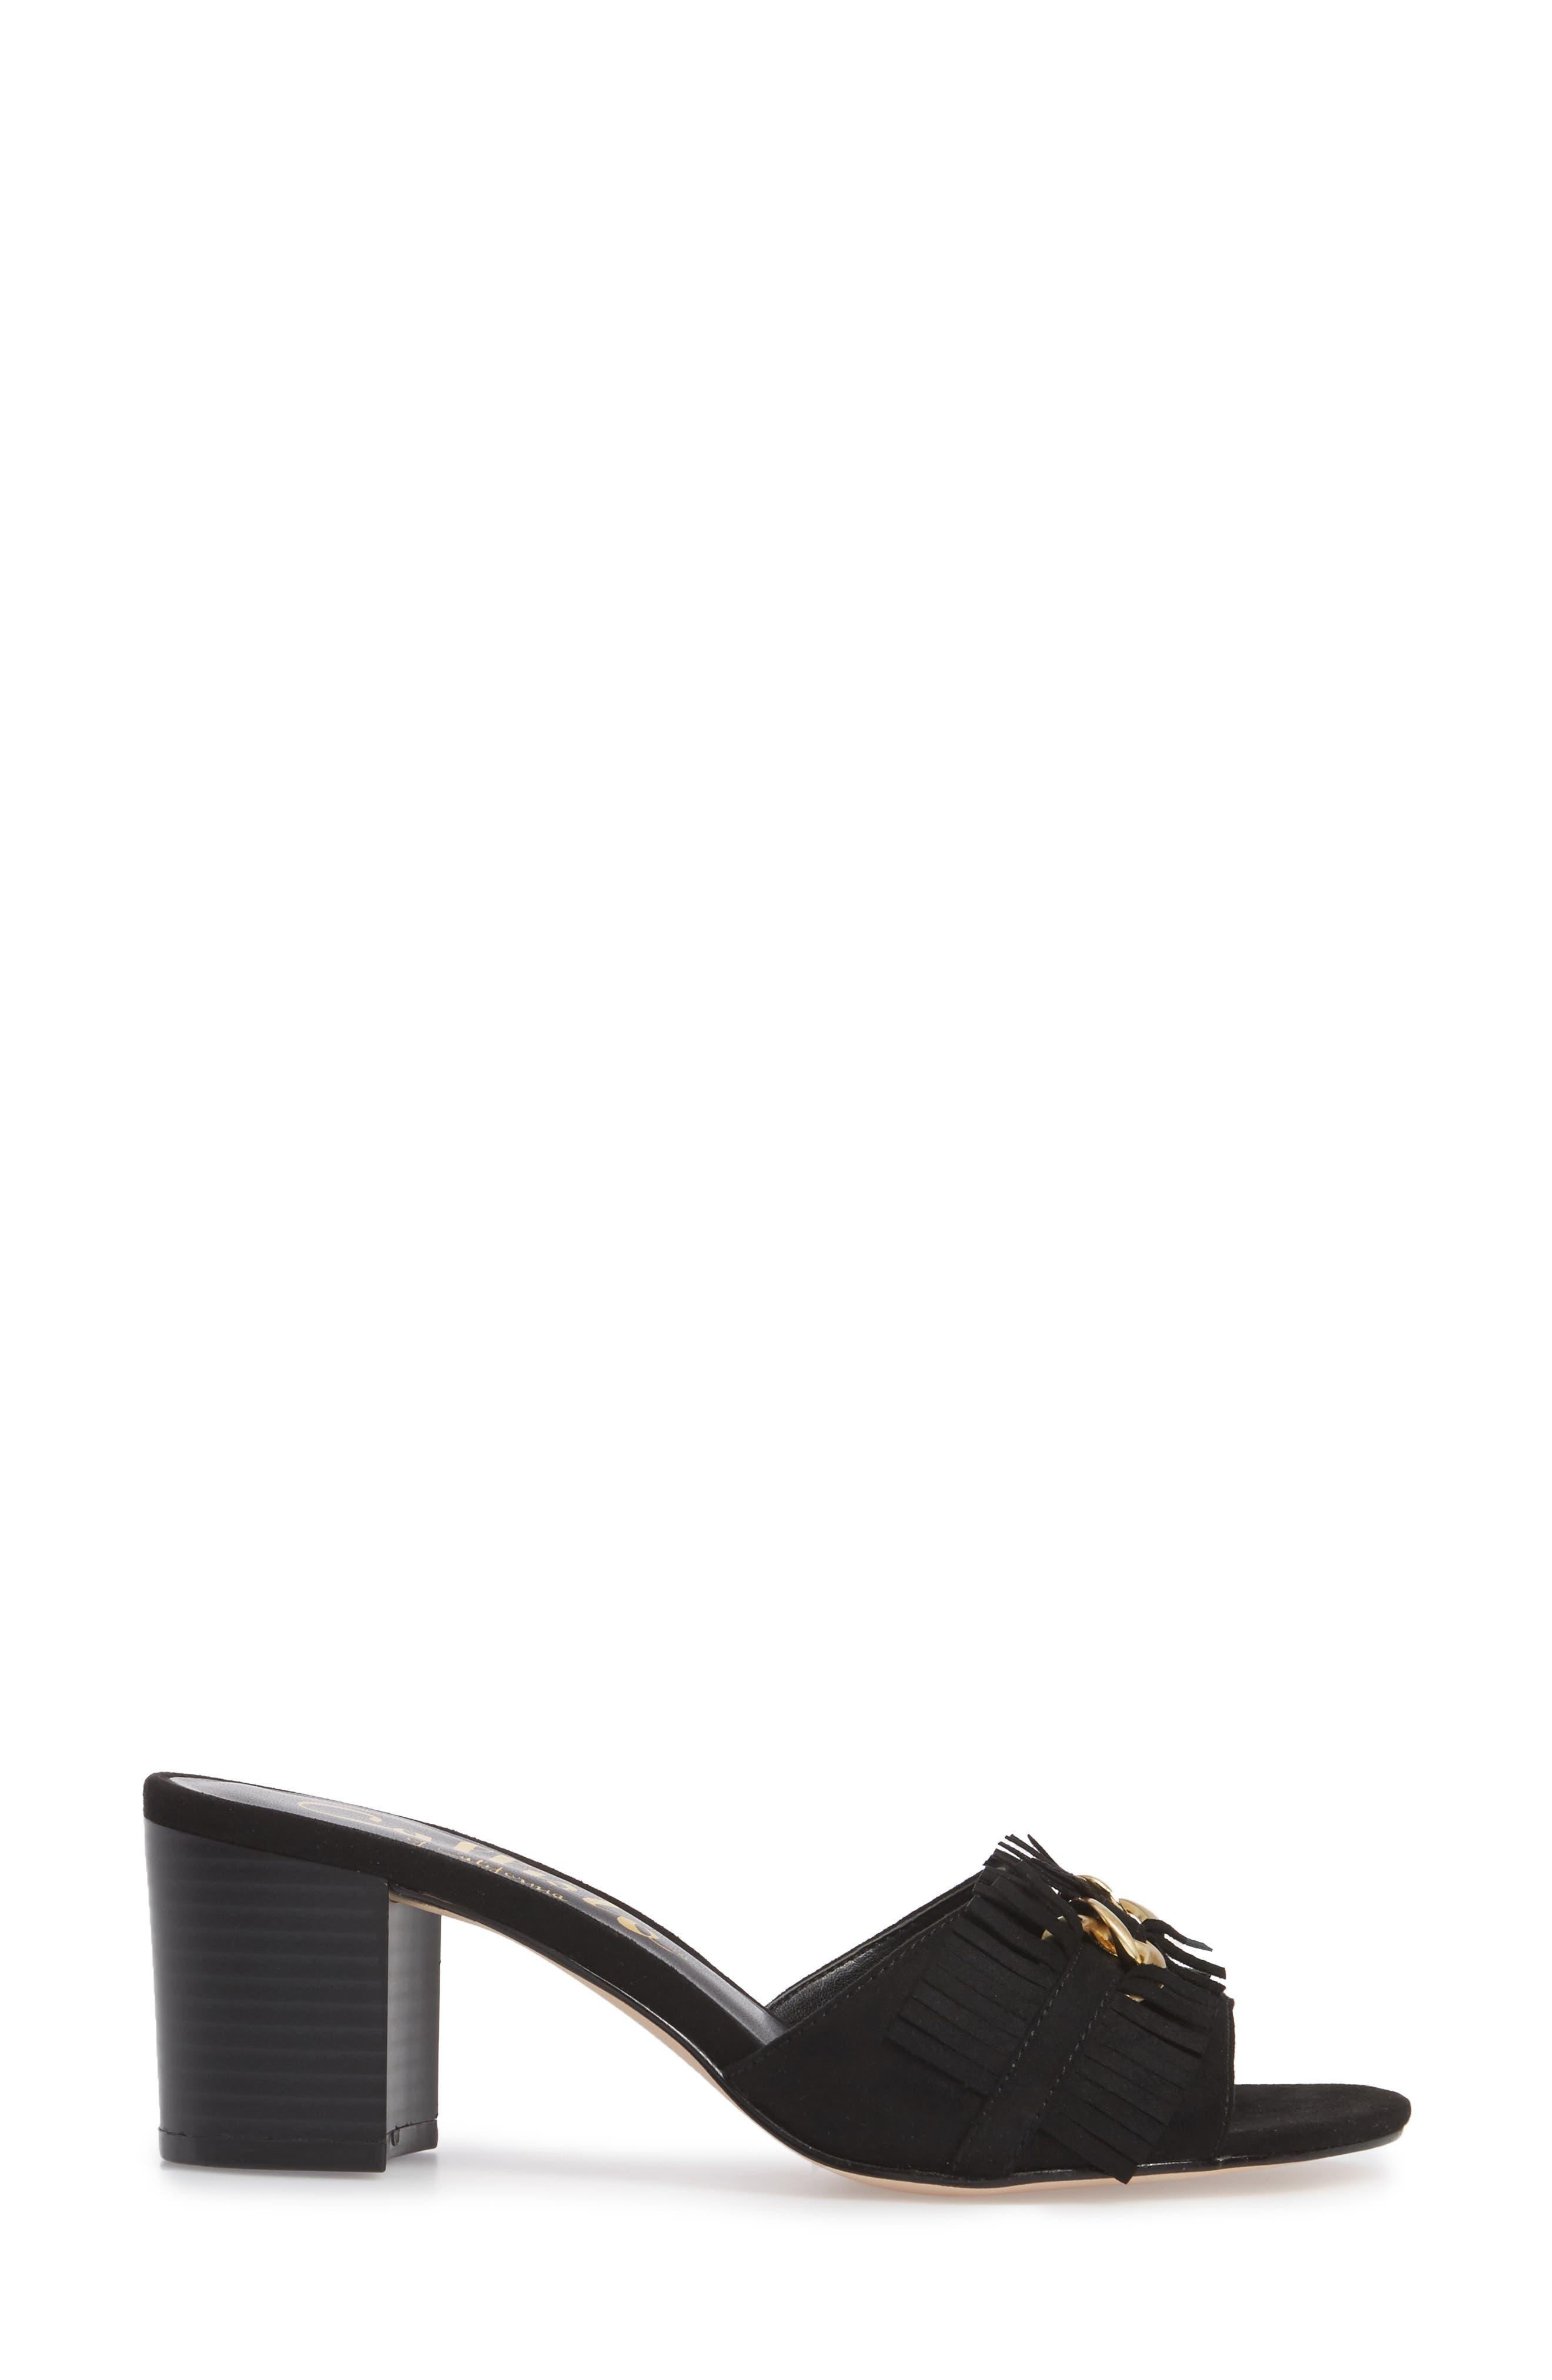 Zinnia Block Heel Slide Sandal,                             Alternate thumbnail 3, color,                             BLACK SUEDE